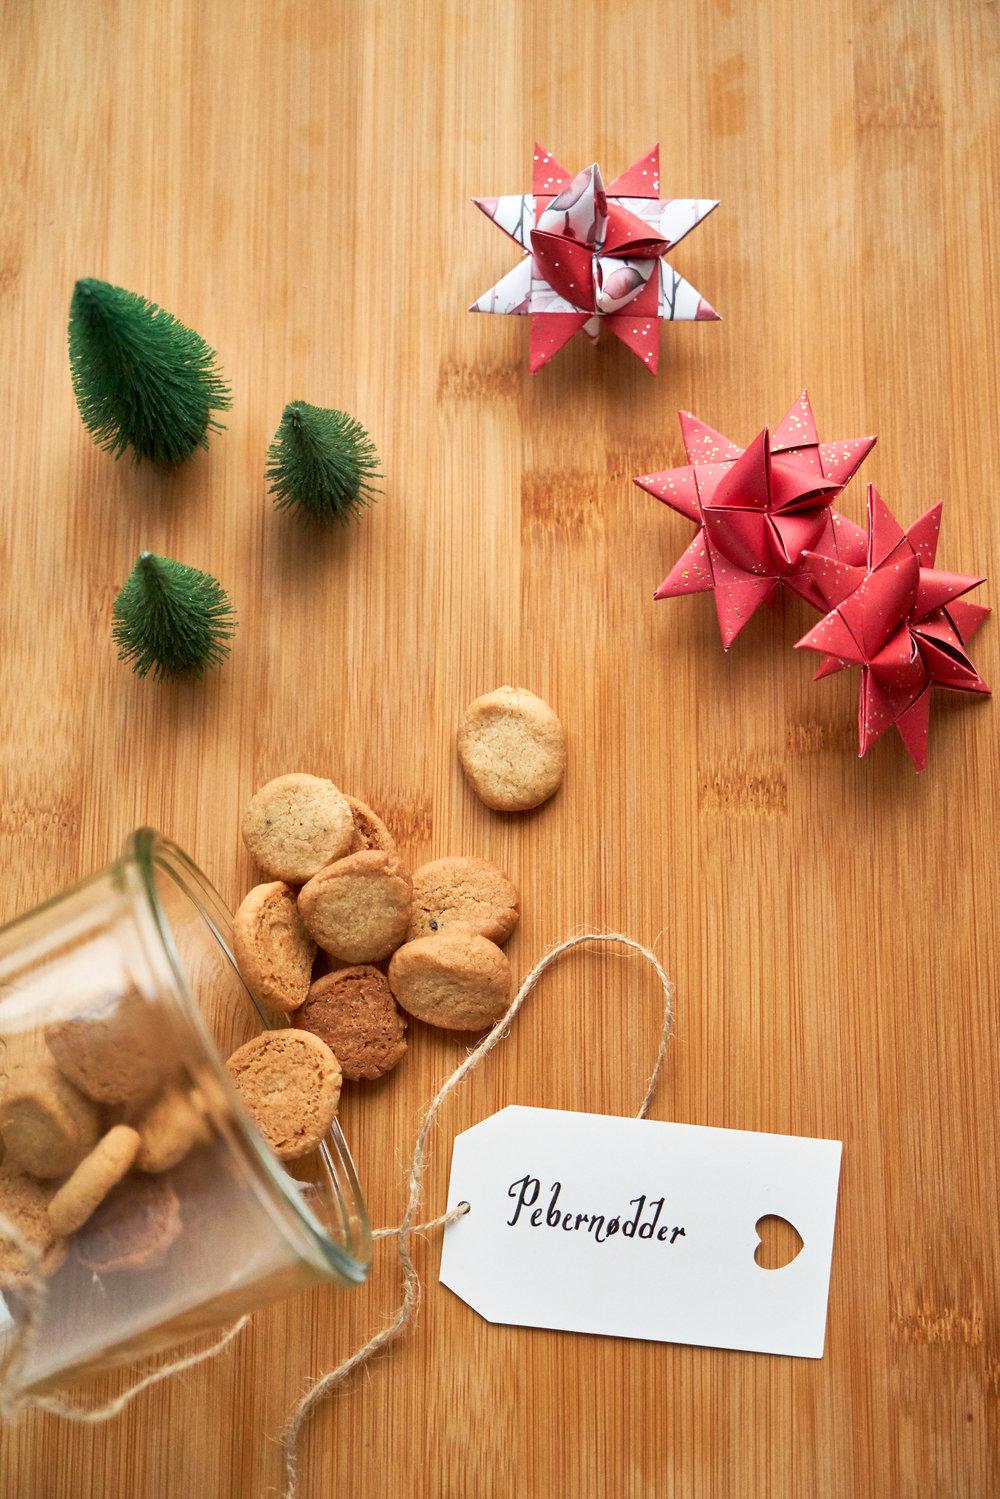 Peppernuts | Pebernødder a la Lagkagehuset | Danish Christmas Cookies | In Carina's Kitchen